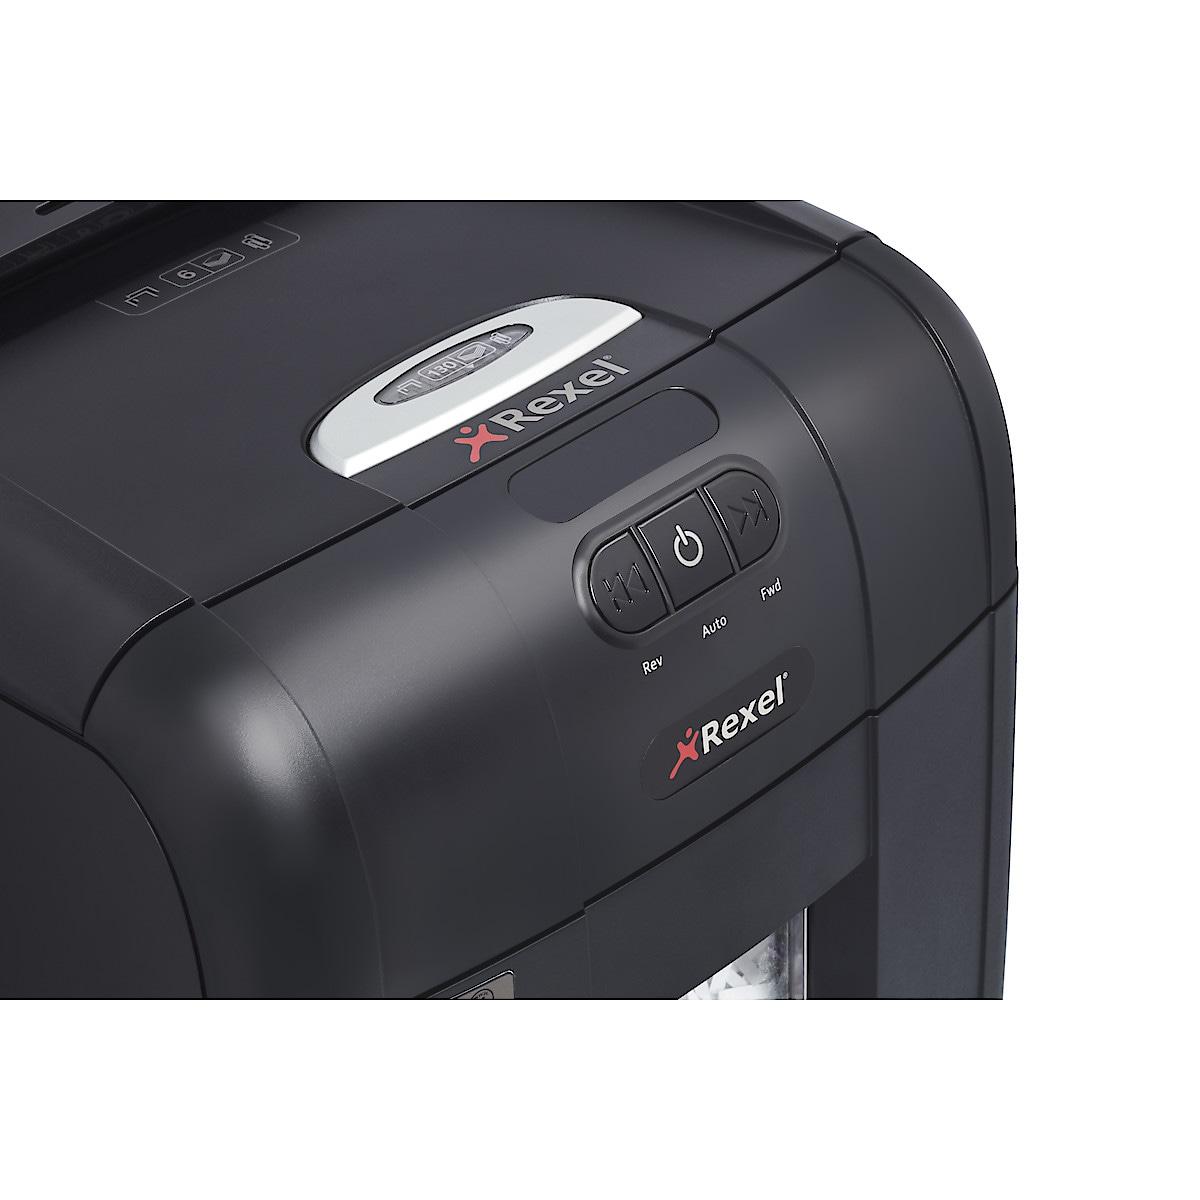 Dokumentförstörare Confetti Auto+ 130X, Rexel